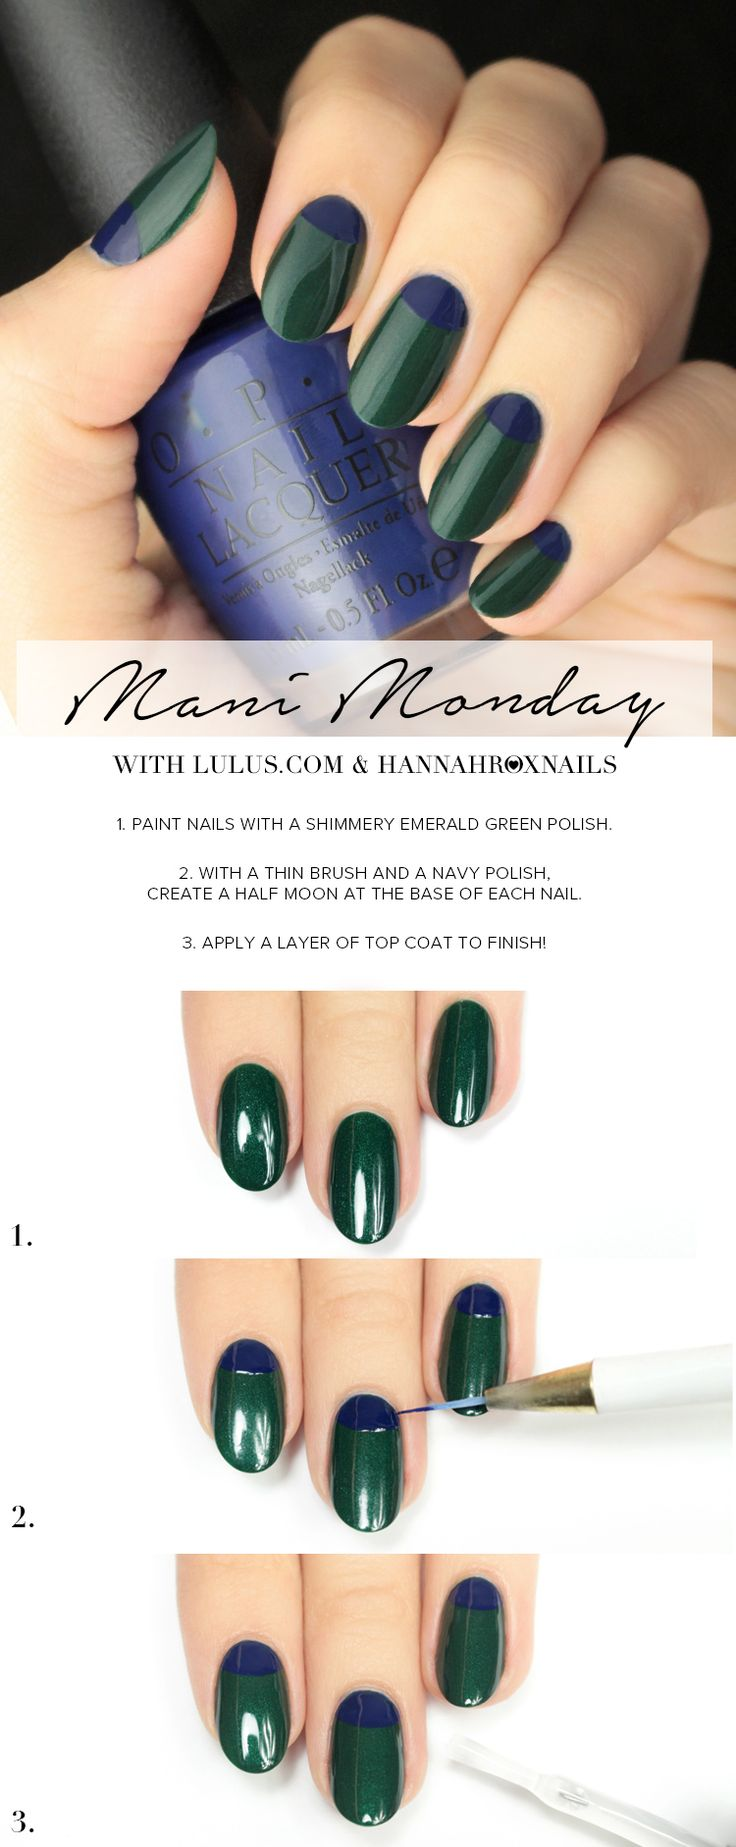 Mani Monday: Blue and Emerald Green Nail Tutorial at LuLus.com!